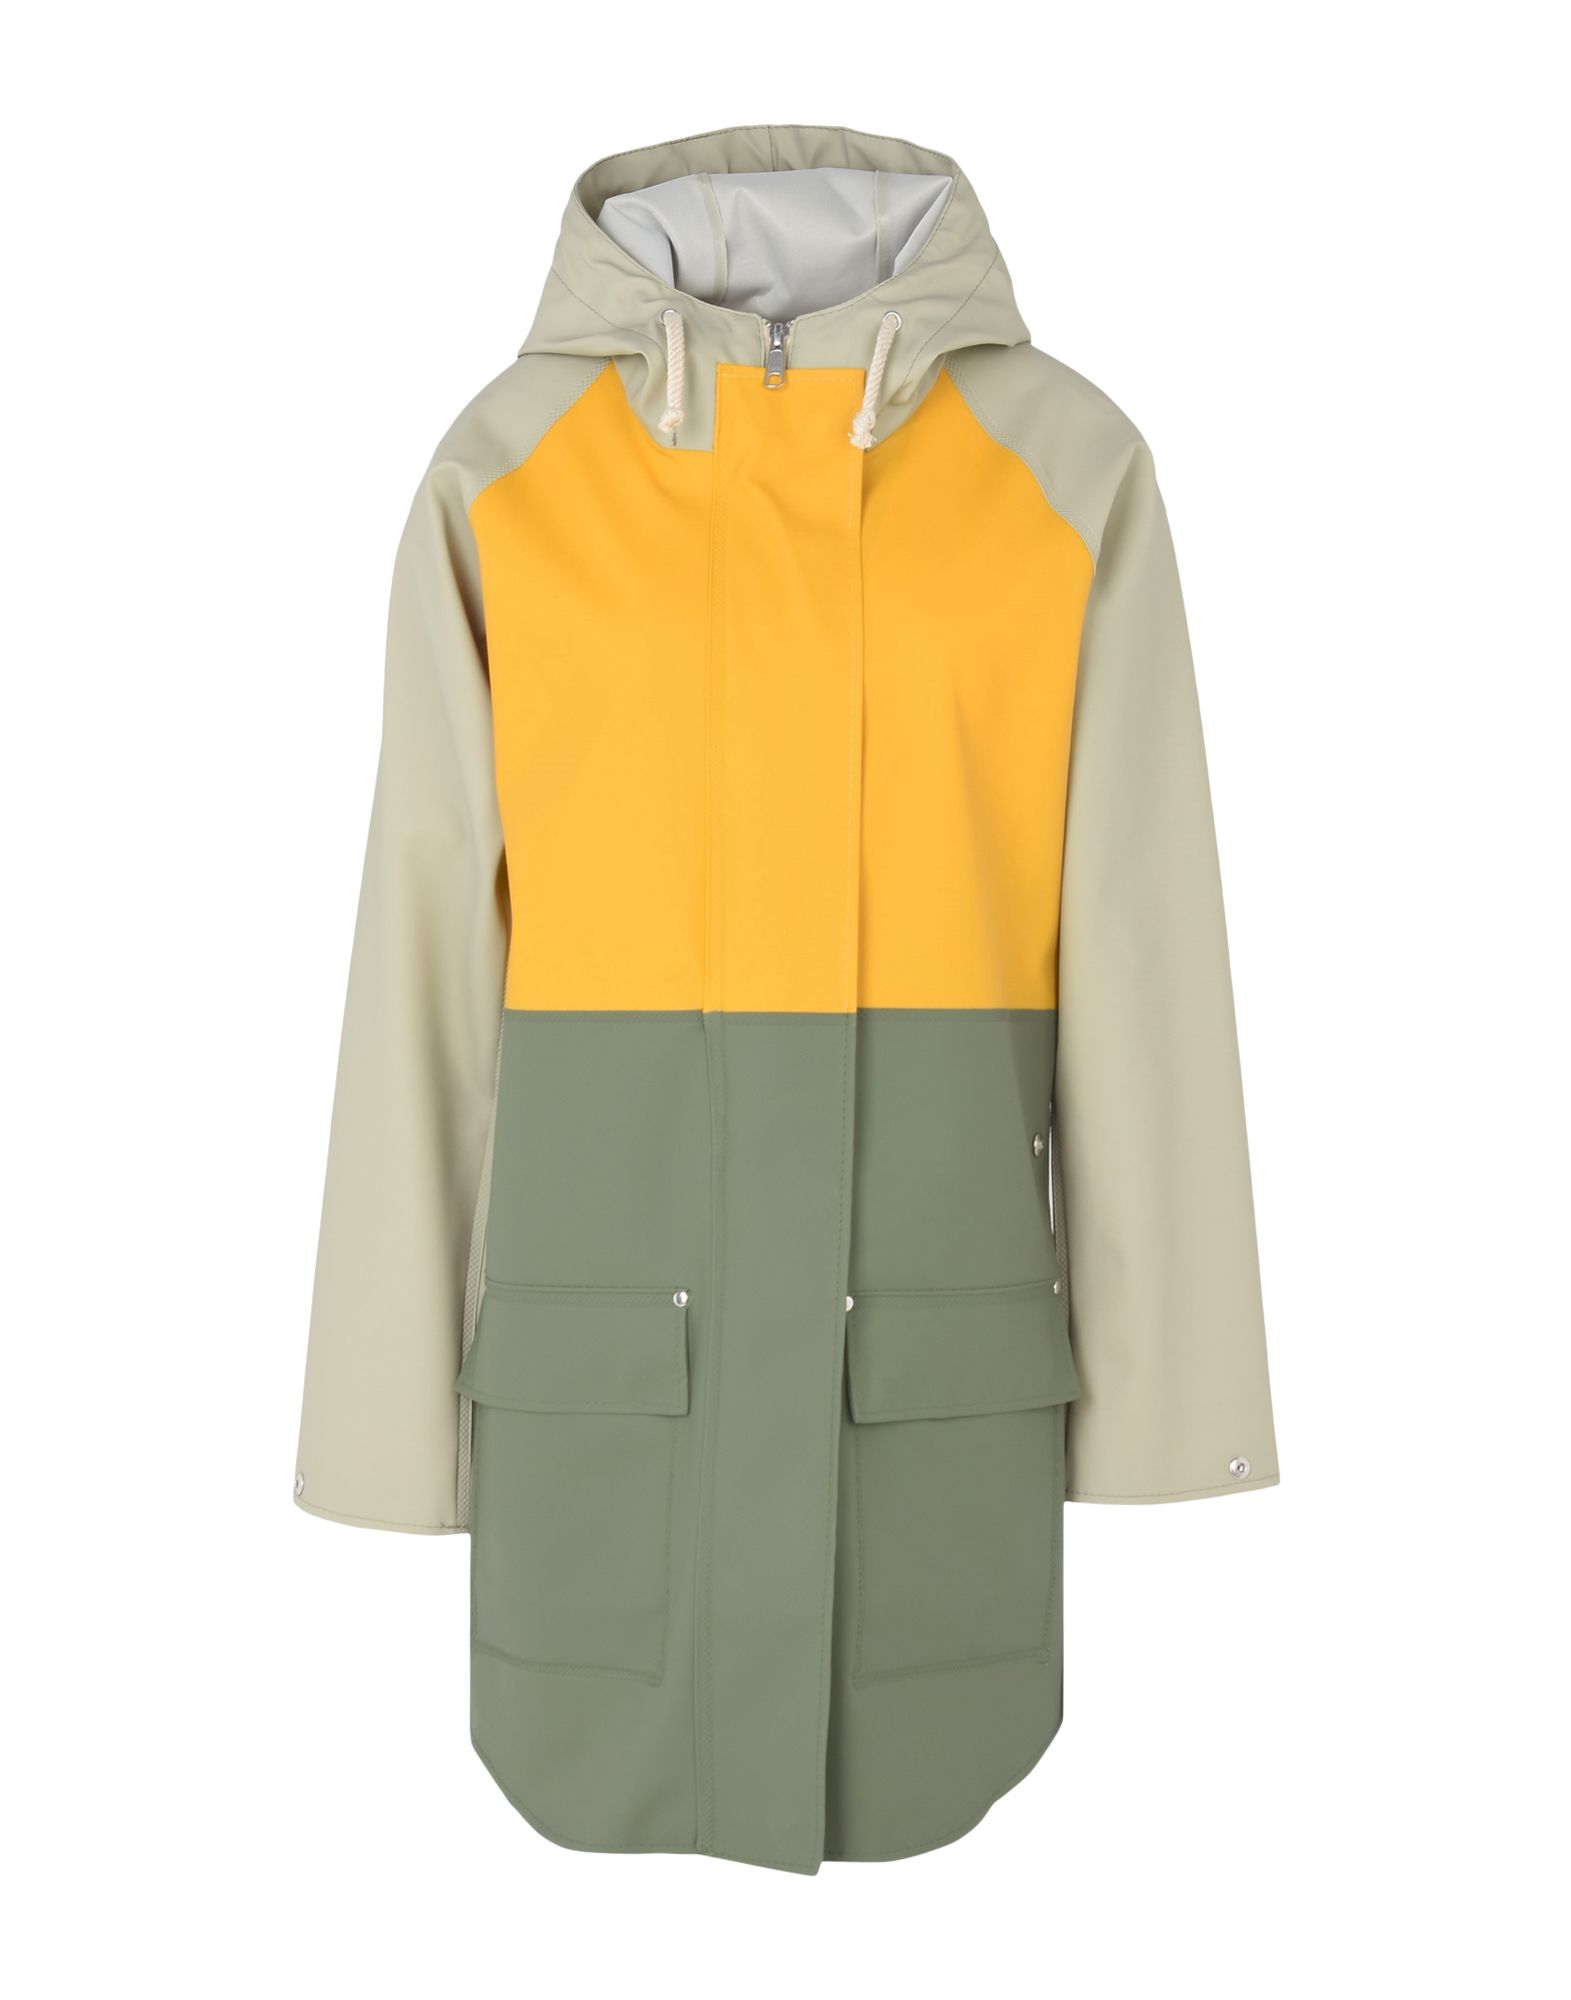 ELKA Full-Length Jacket in Yellow